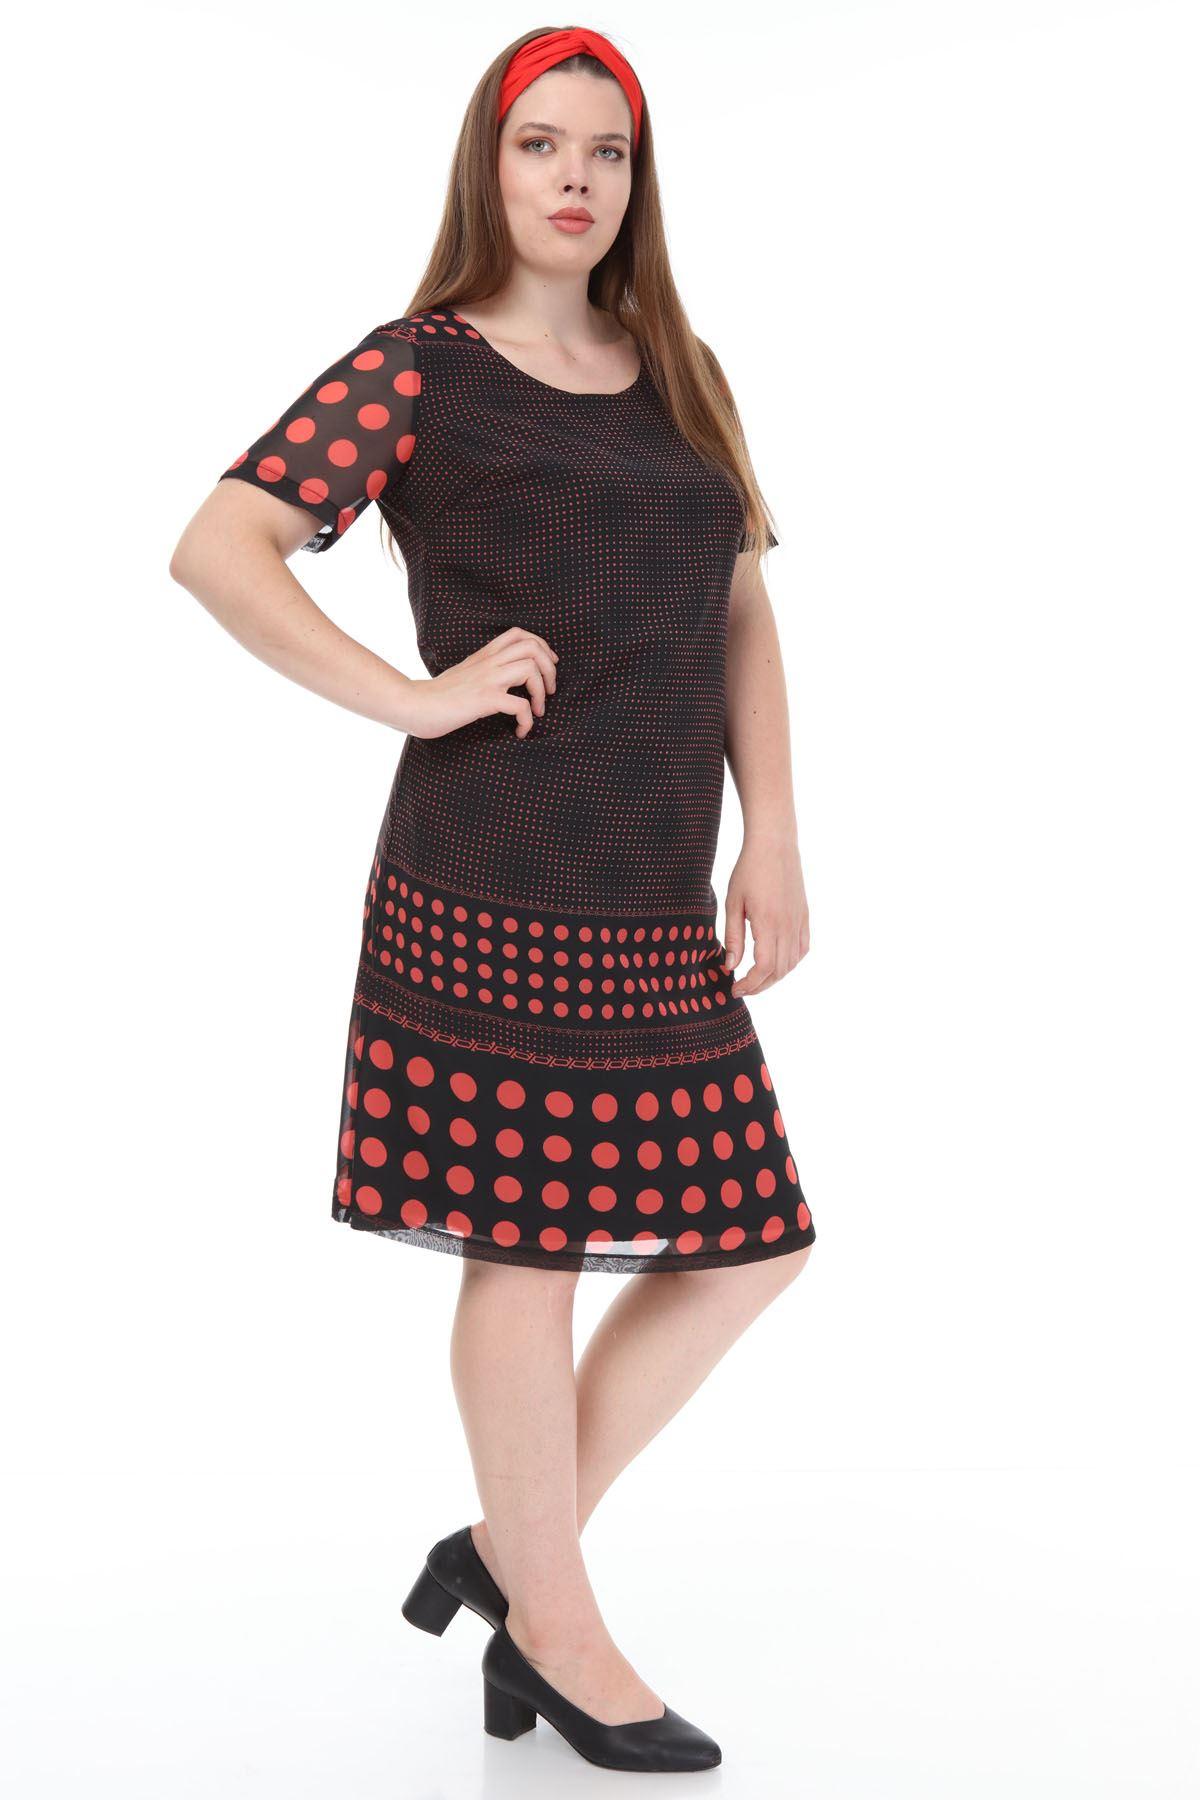 Siyah Puanlı Şifon Elbise F3-1129